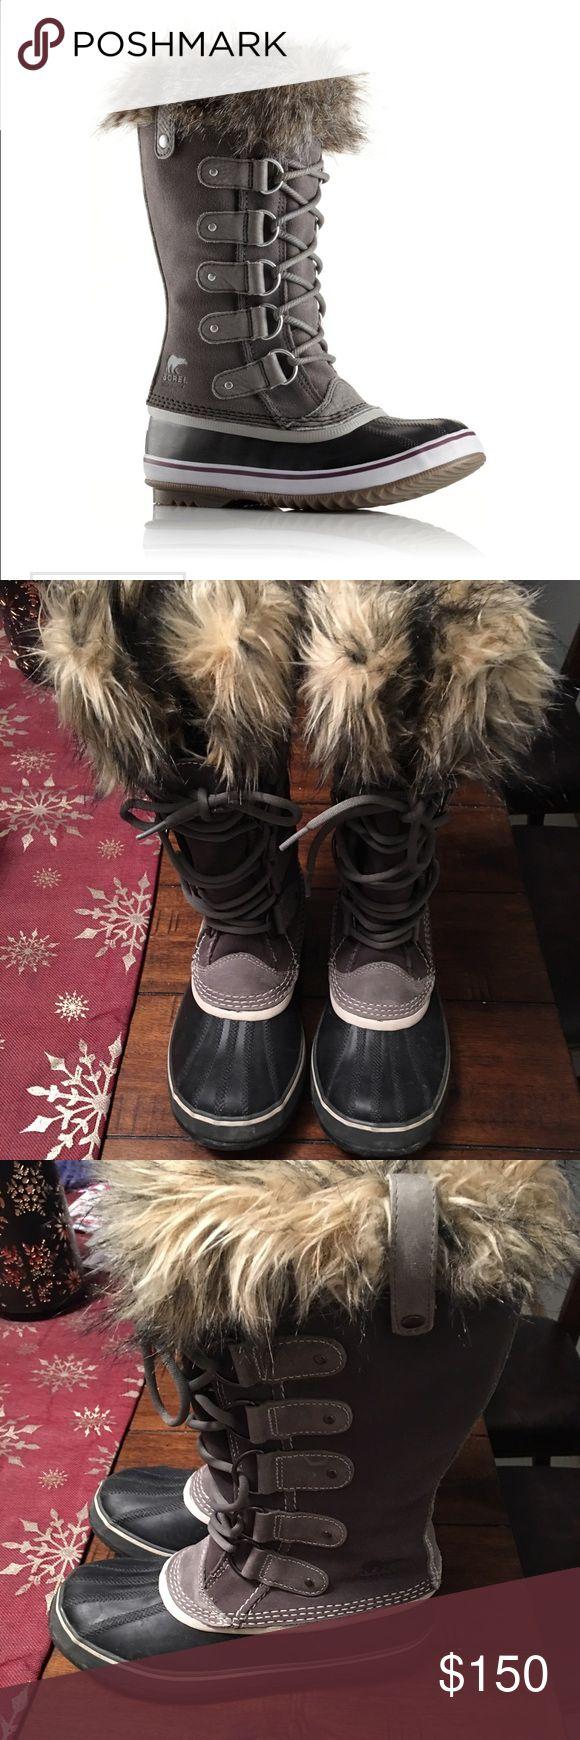 New Sorel Joan of arc boots Worn twice. Sorel Shoes Winter & Rain Boots